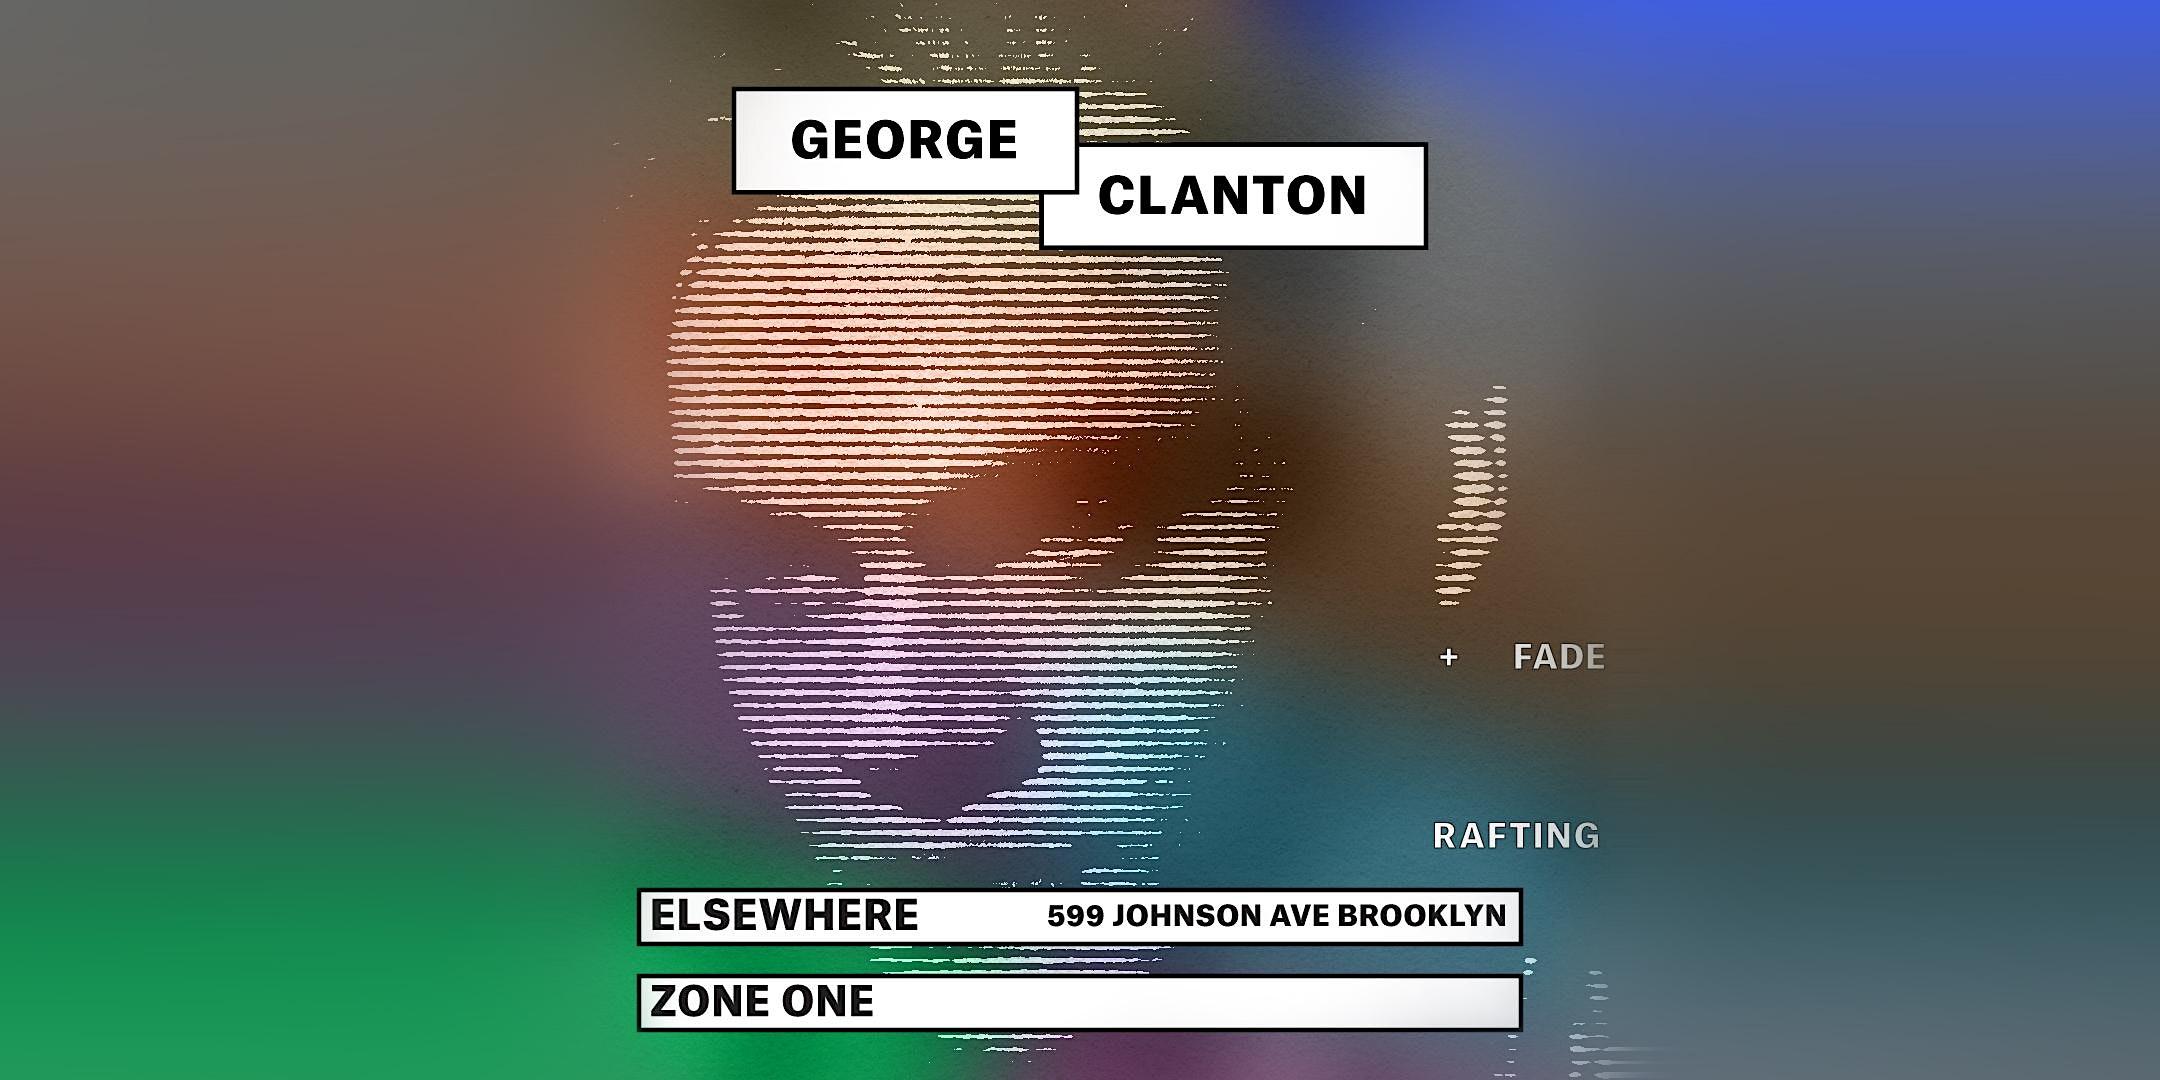 George Clanton, FADE (Single Release), Rafting